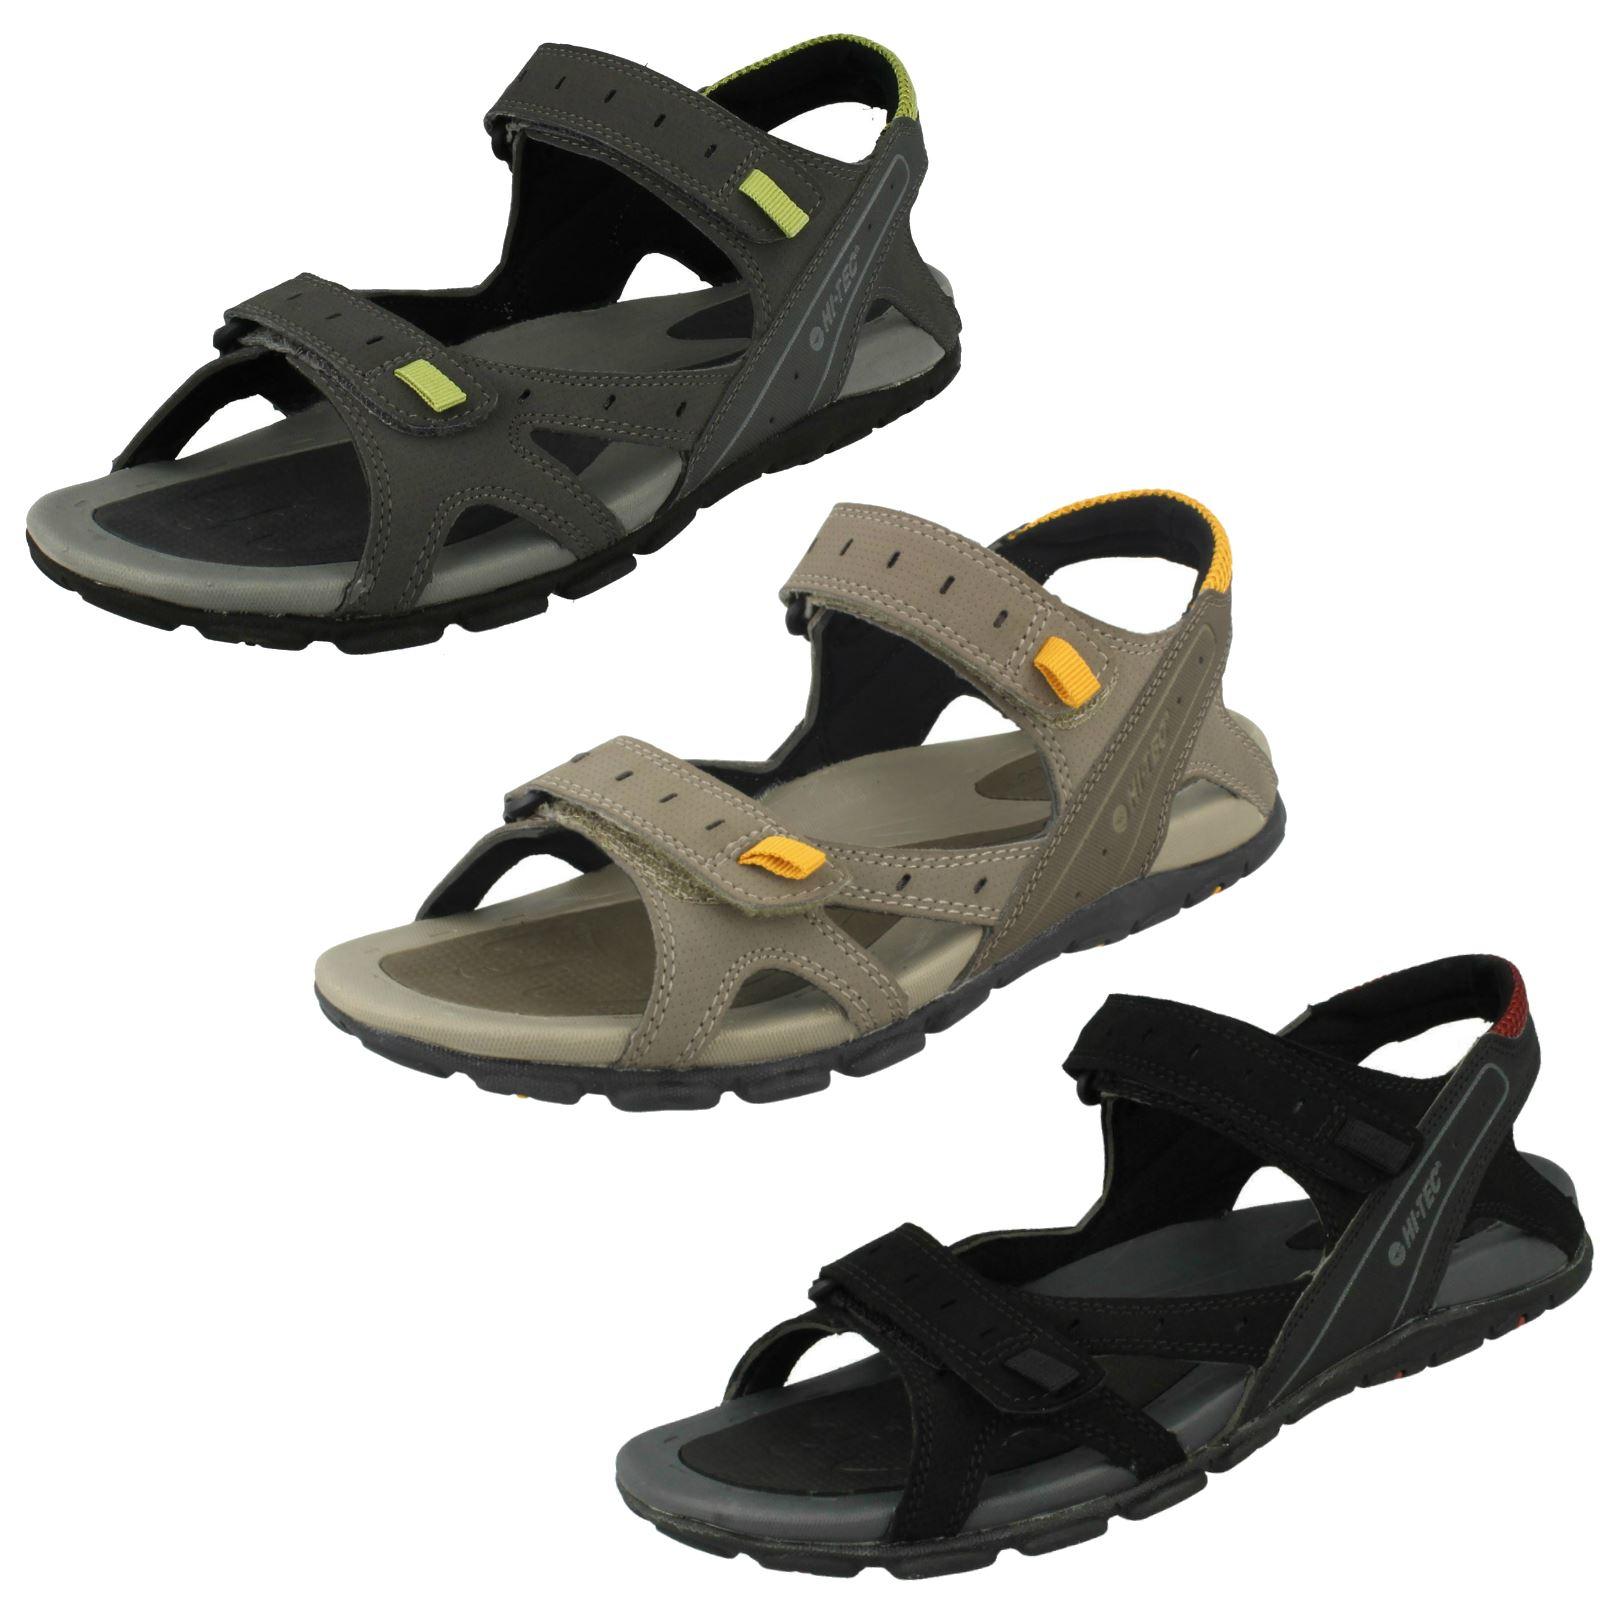 5b9e604eb31e Details about Mens Hi-Tec Casual Summer Sandals - Laguna Strap